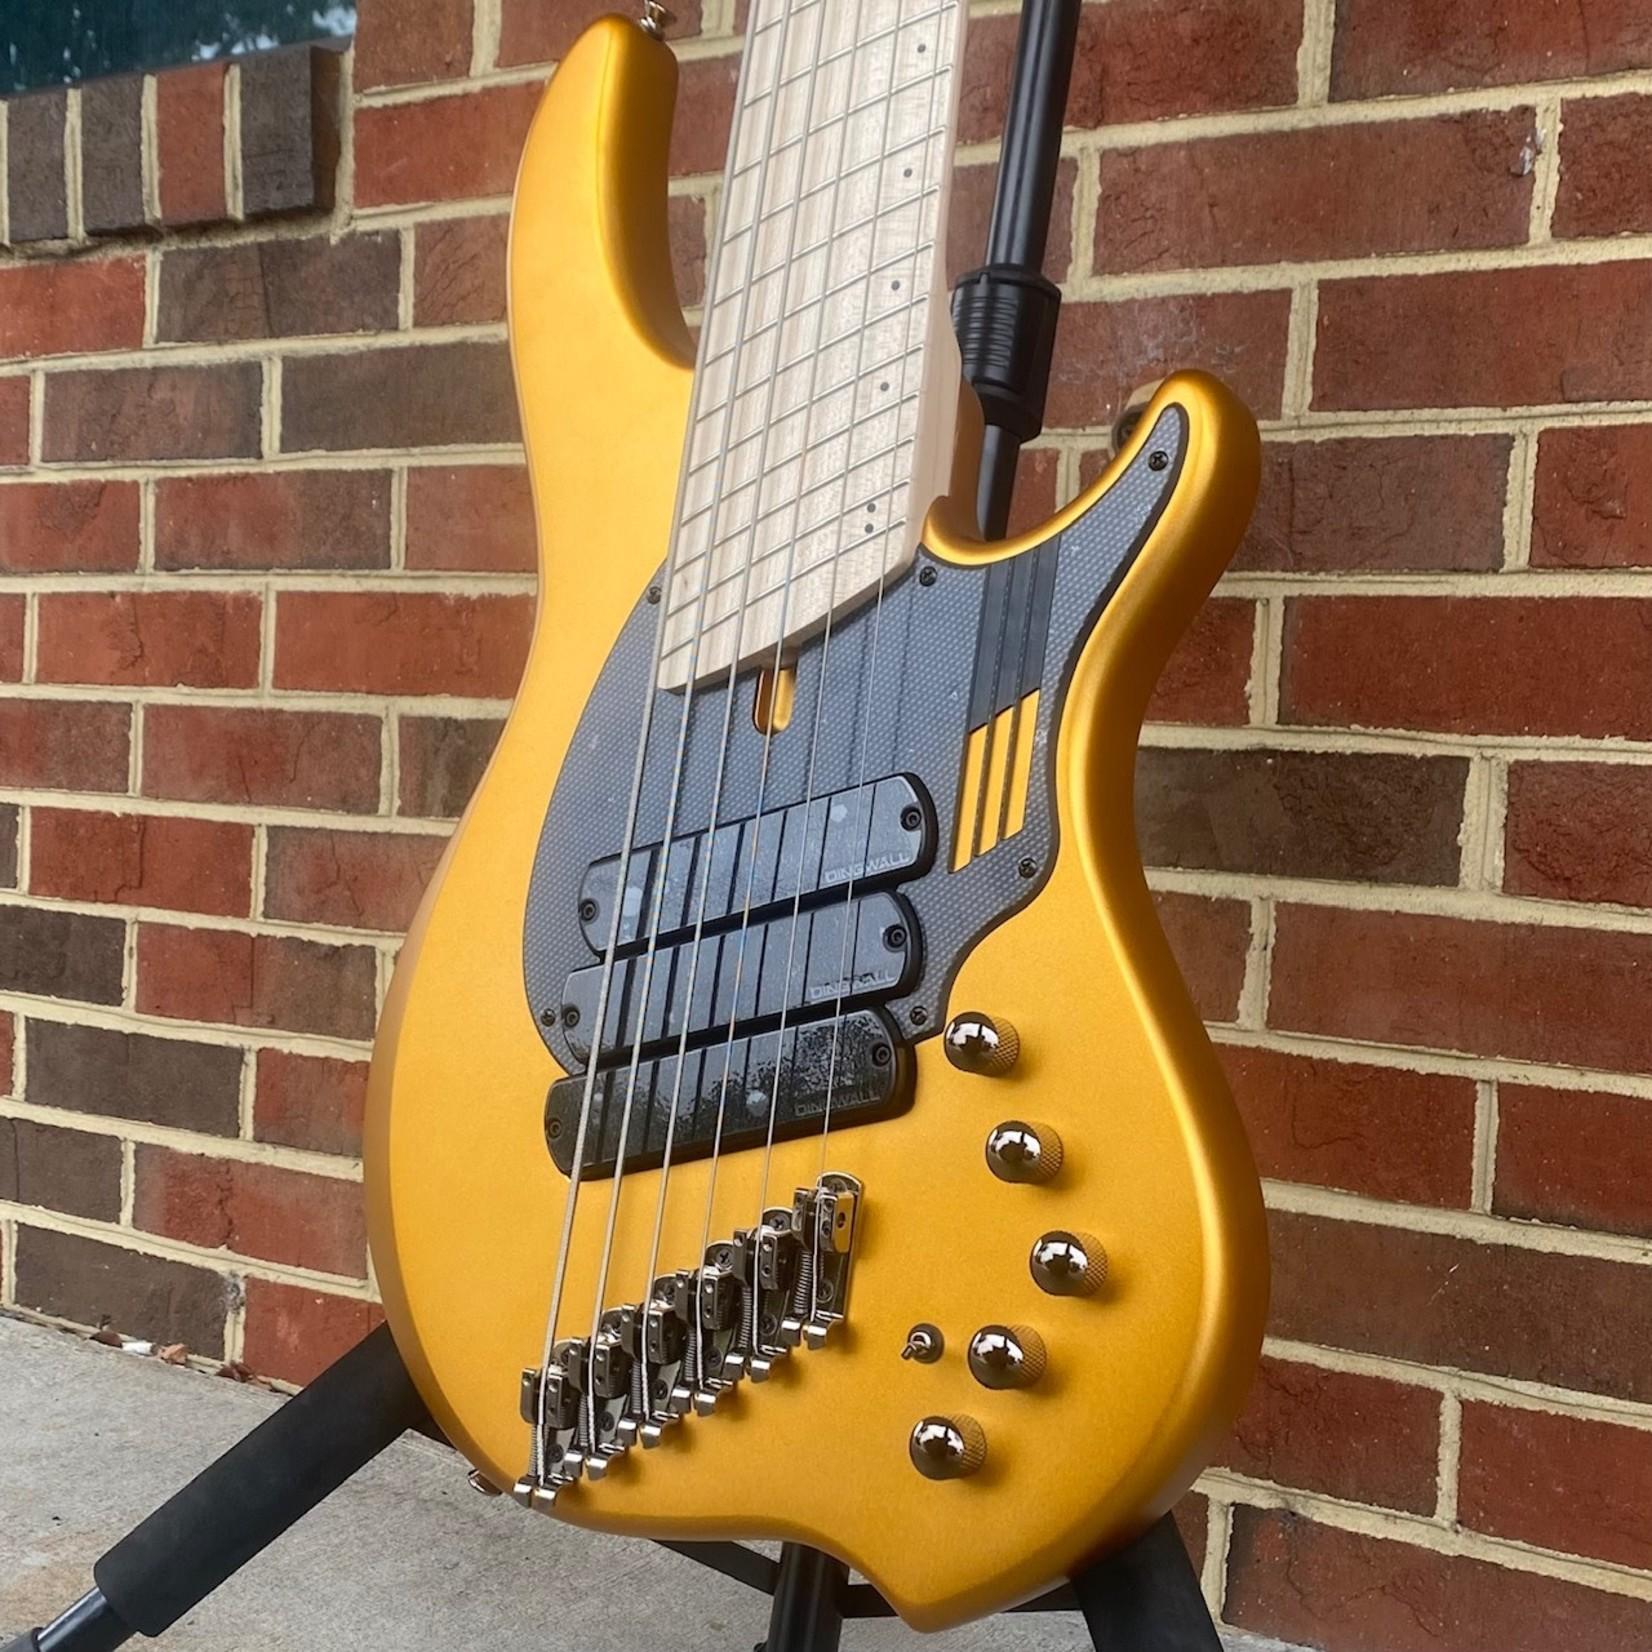 Dingwall Dingwall NG3 6-String, Matte Gold Metallic, Maple Fretboard, Matching Headstock, Dingwall Gig Bag, SN# 10069